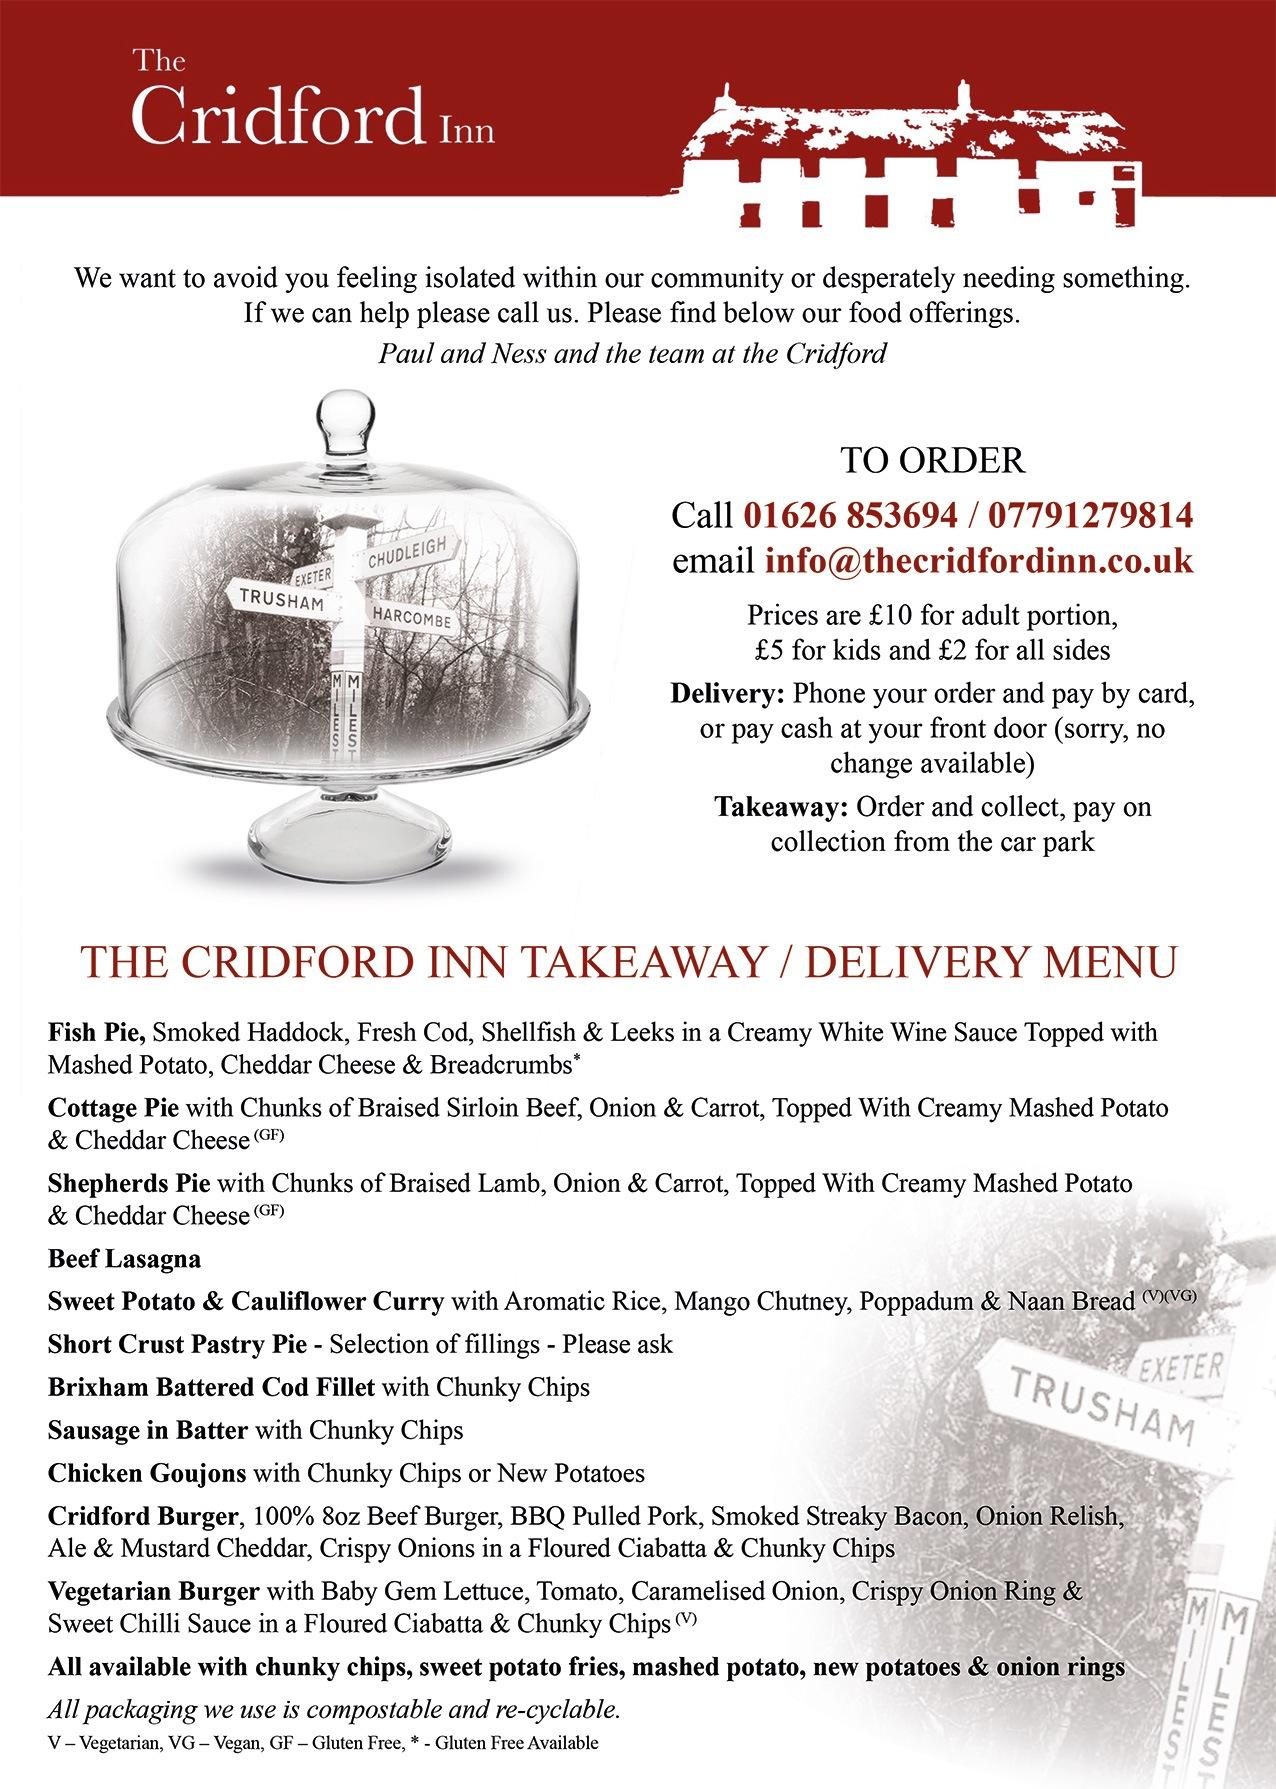 Cridford-Inn-Takeaway--001